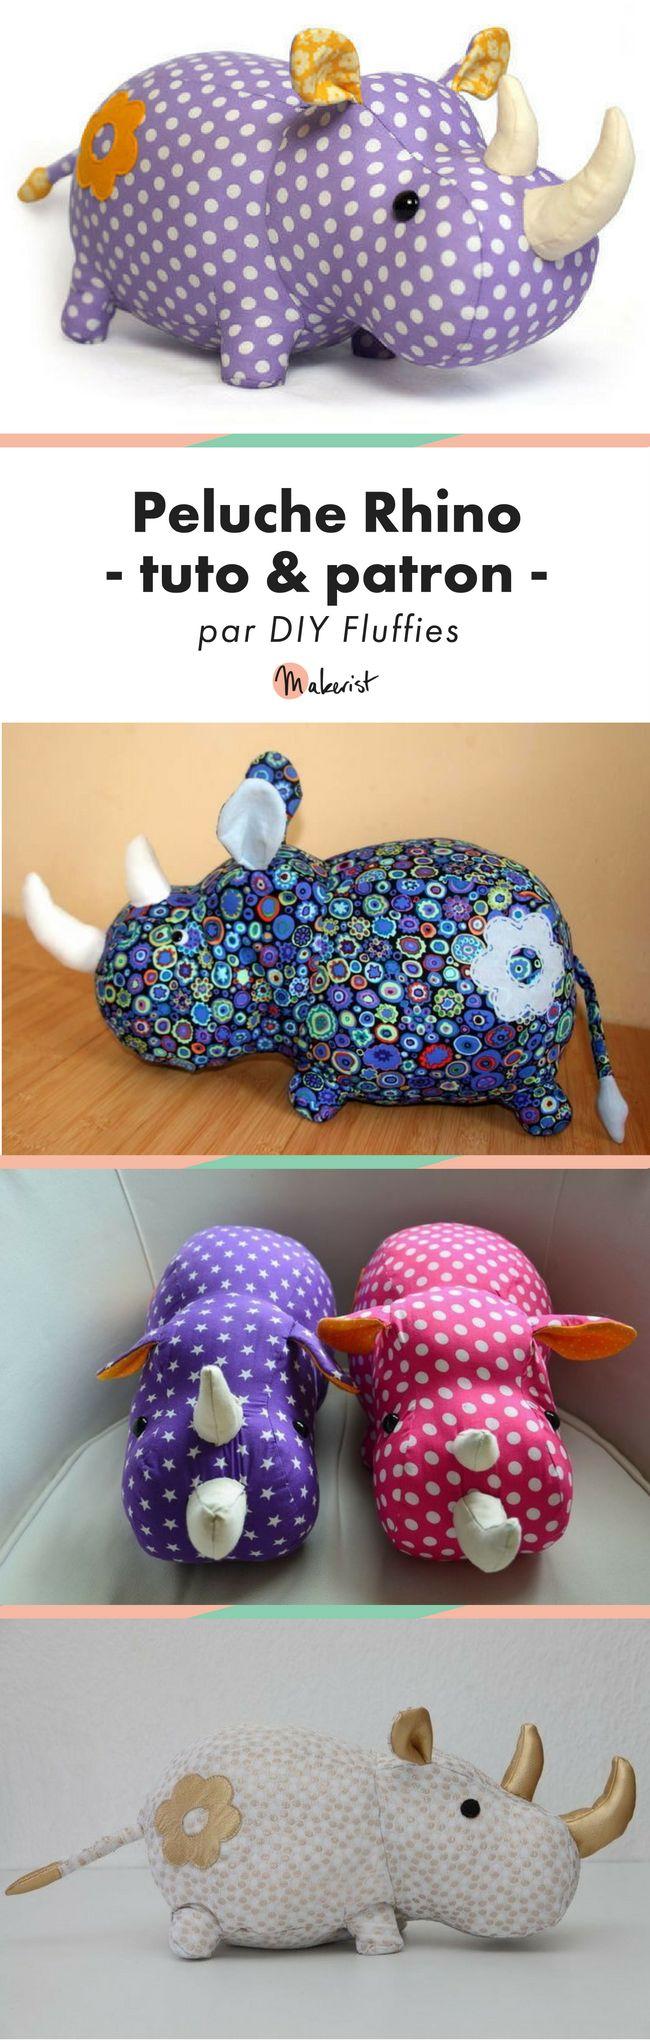 Tuto - Tutoriel - Patron - Peluche - Rhino - Couture - DIY - Fluffy